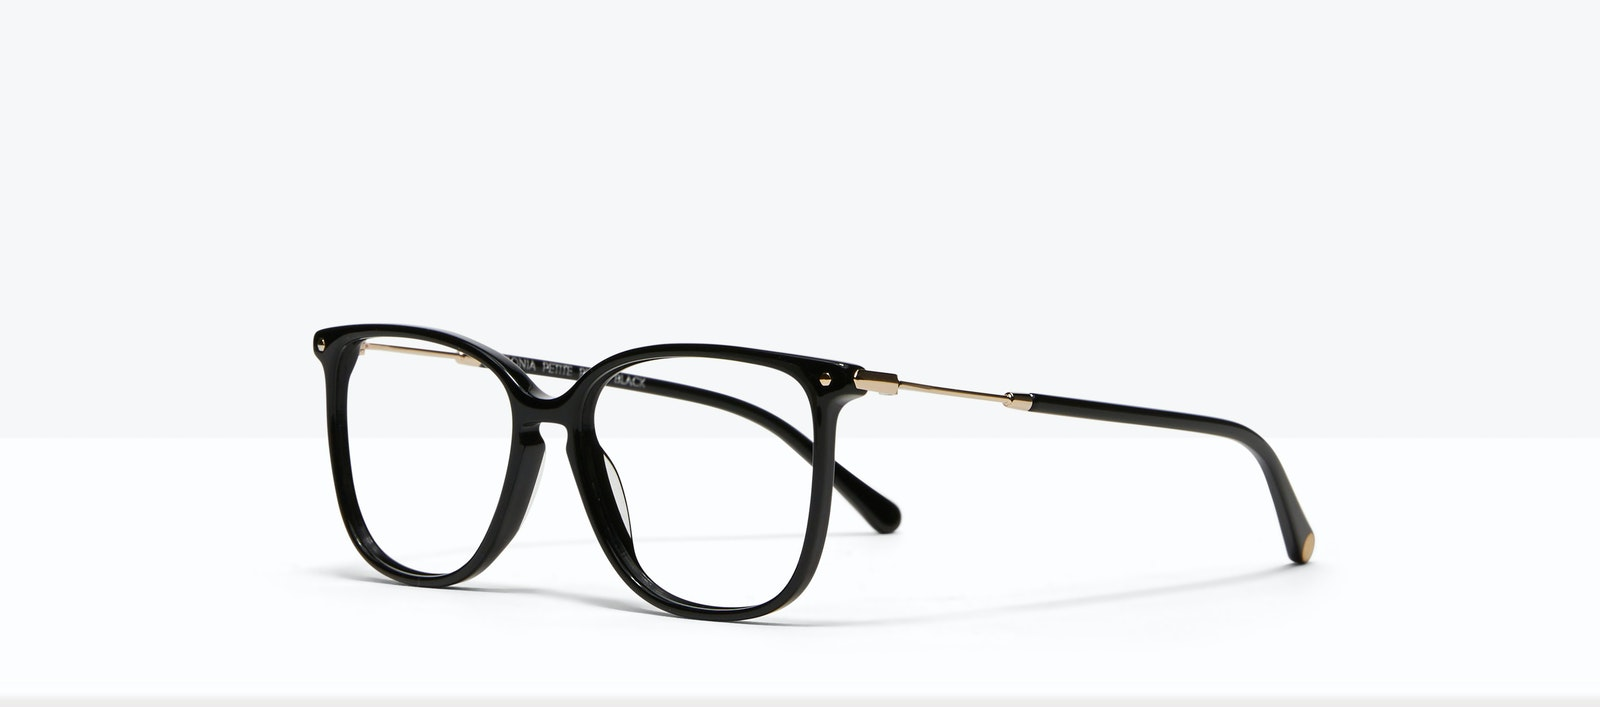 Affordable Fashion Glasses Square Eyeglasses Women Sonia Petite Pitch Black Tilt